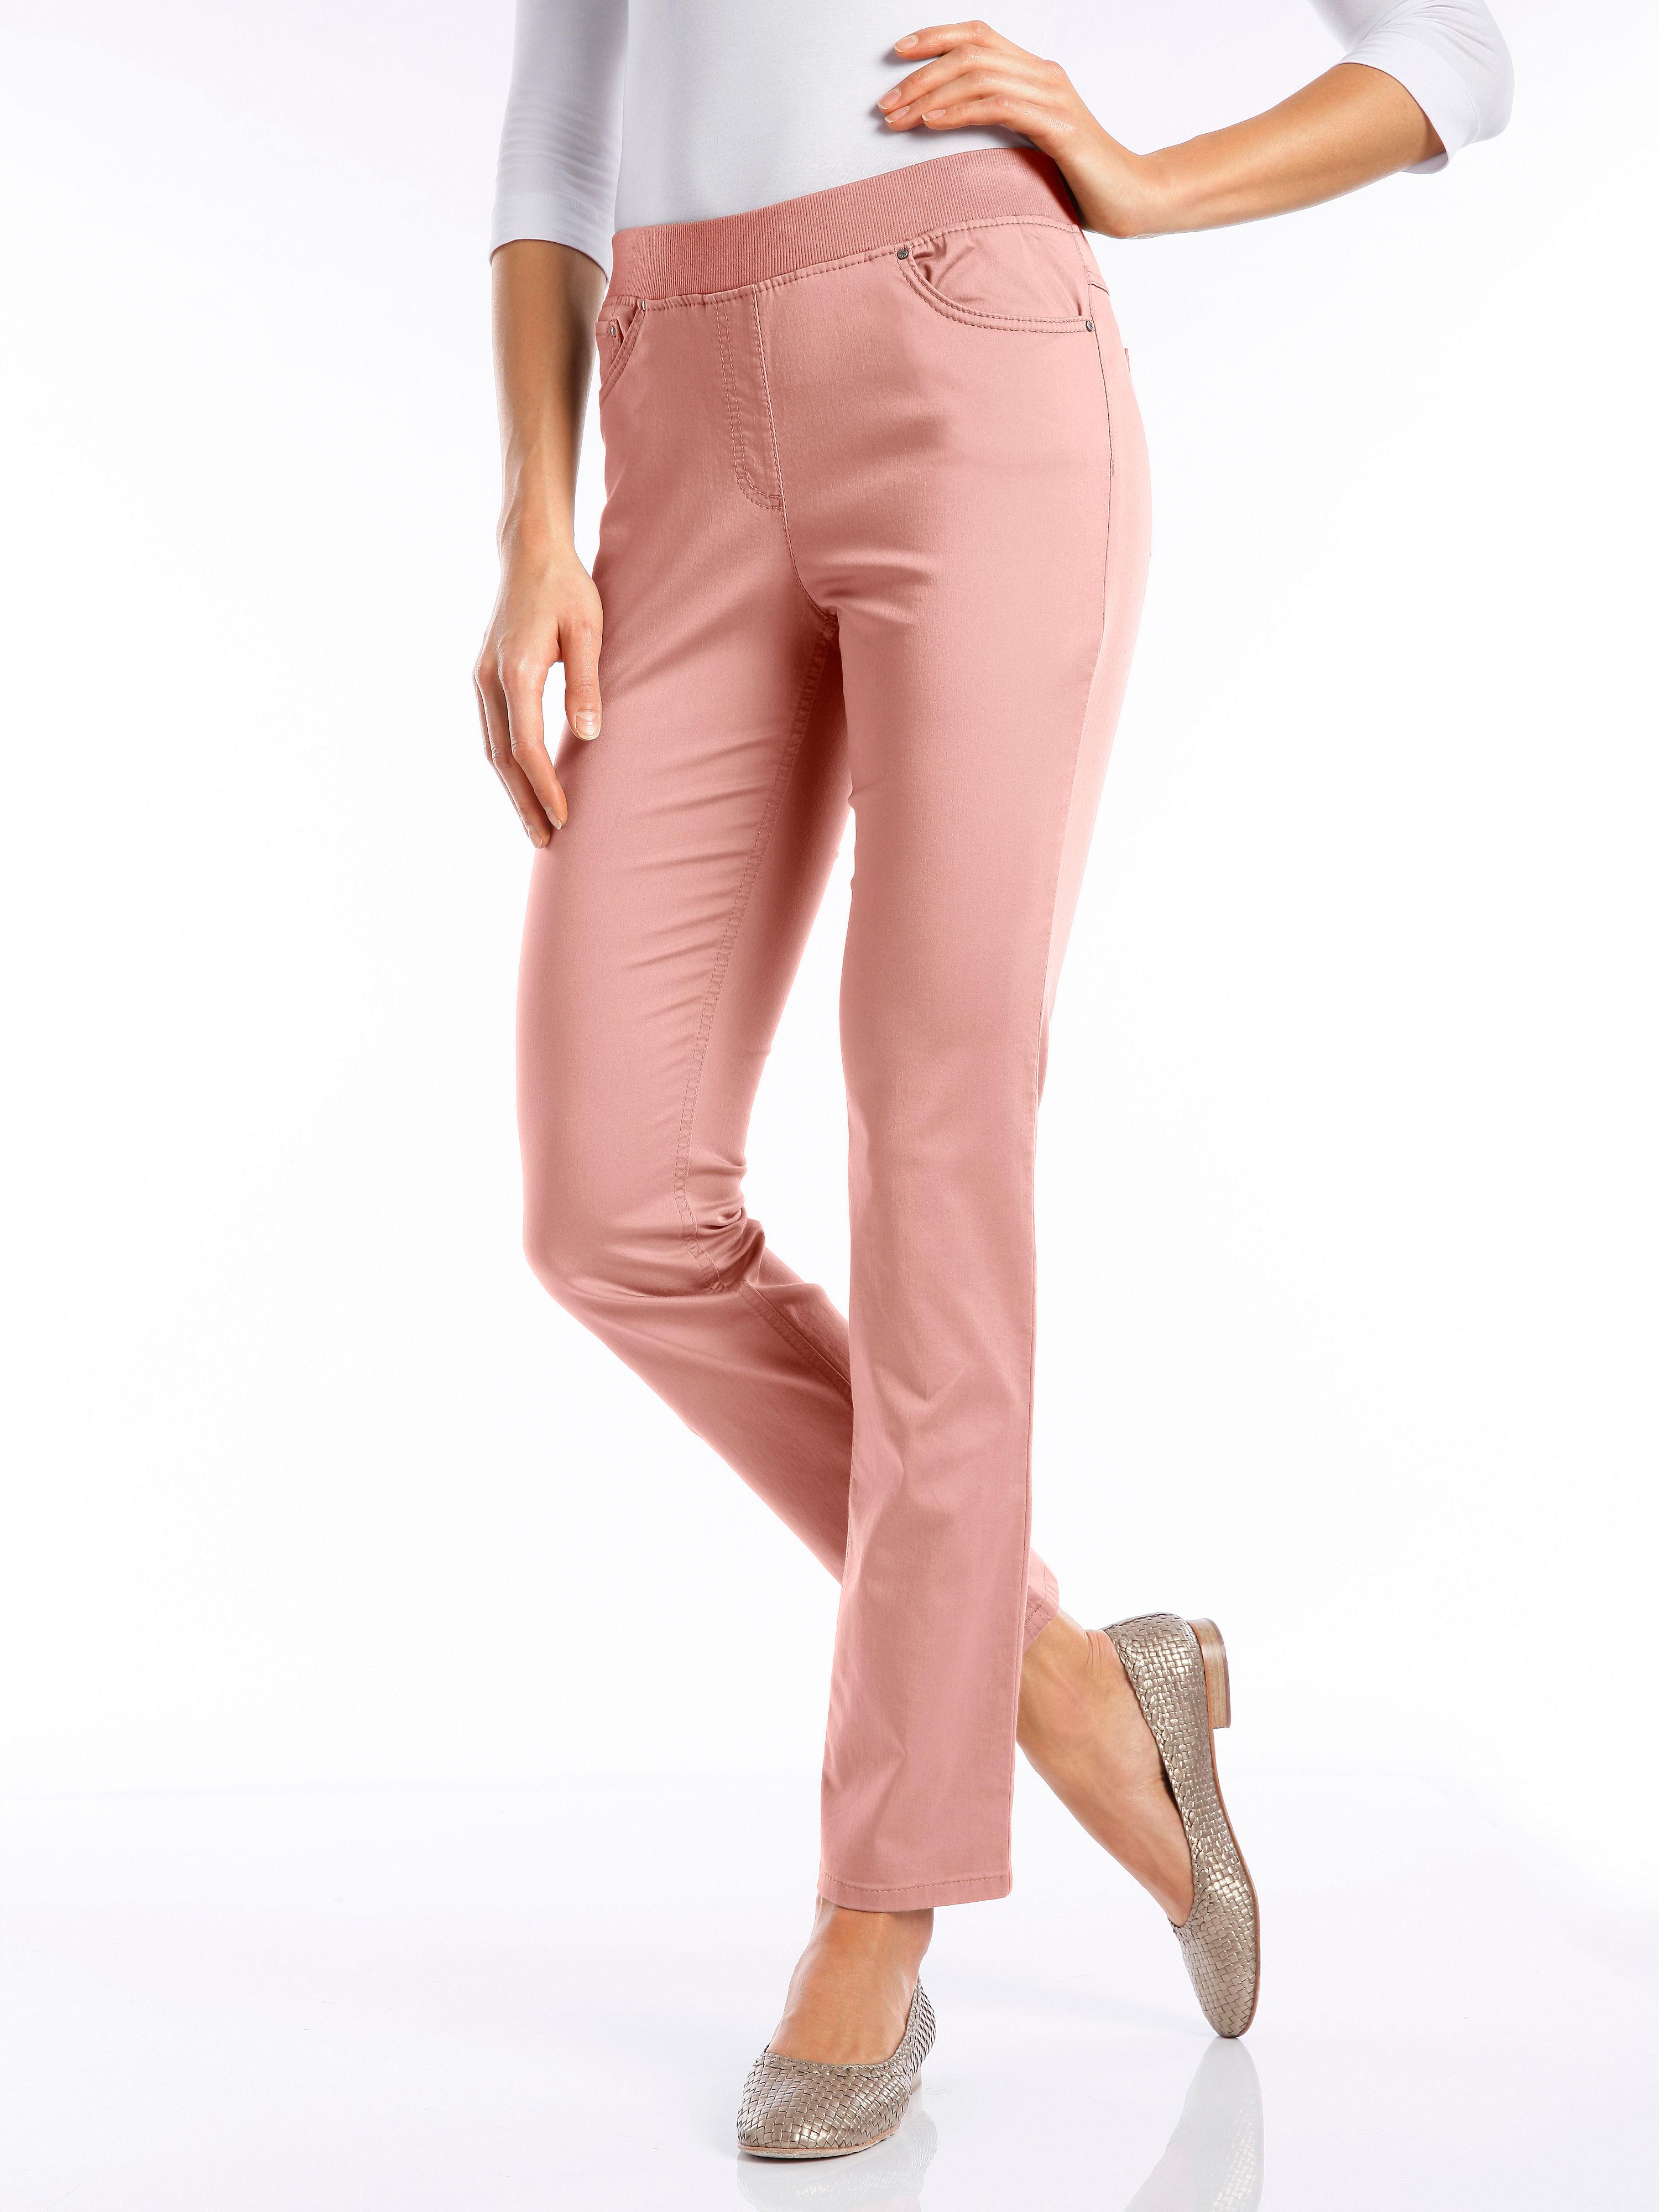 Le pantalon Comfort Plus, modèle CARINA Raphaela by Brax rose taille 50